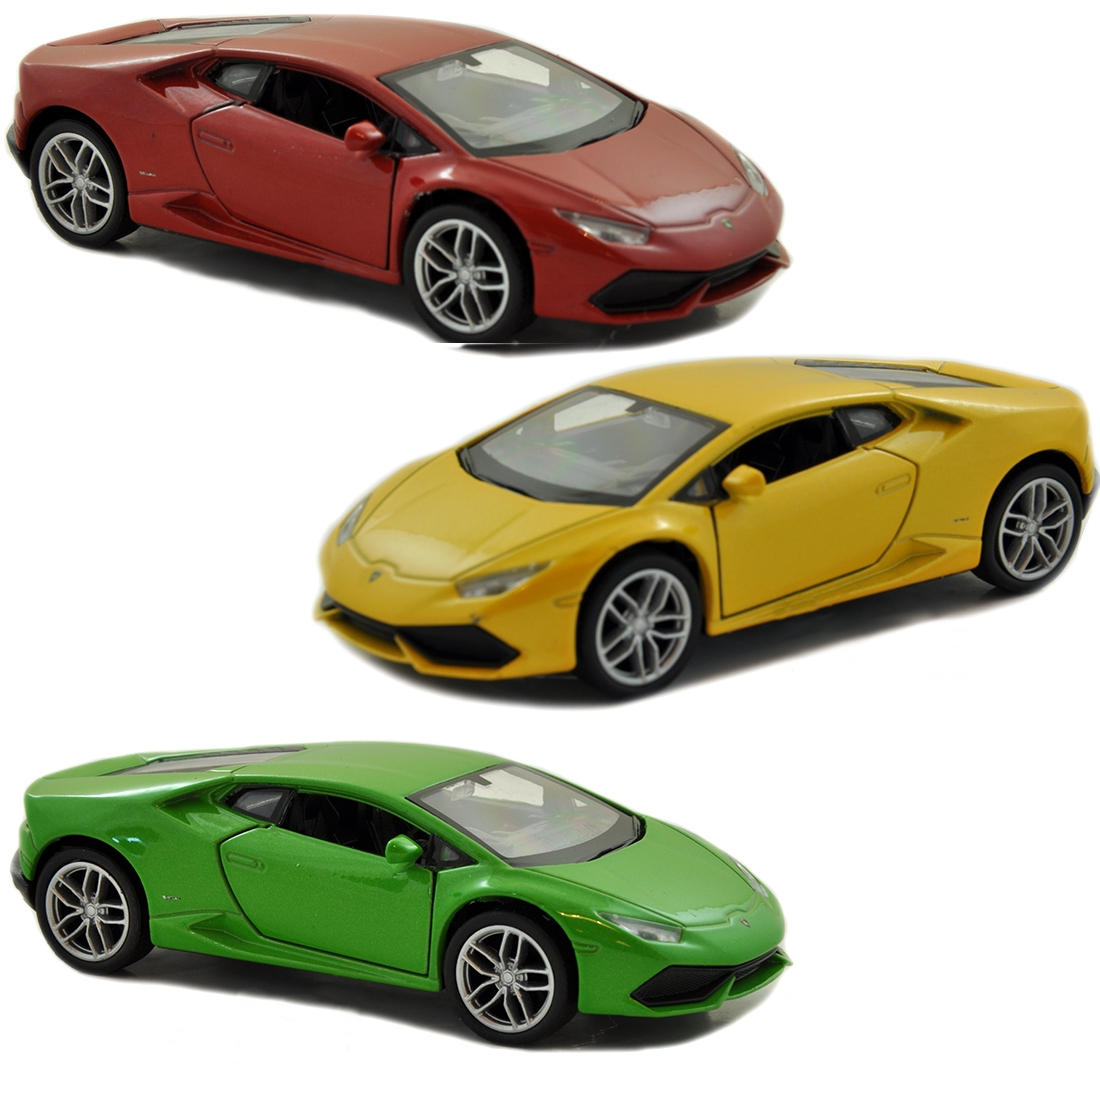 Модель машины Lamborghini Huracan LP610-4, 1:24Lamborghini<br>Модель машины Lamborghini Huracan LP610-4, 1:24<br>